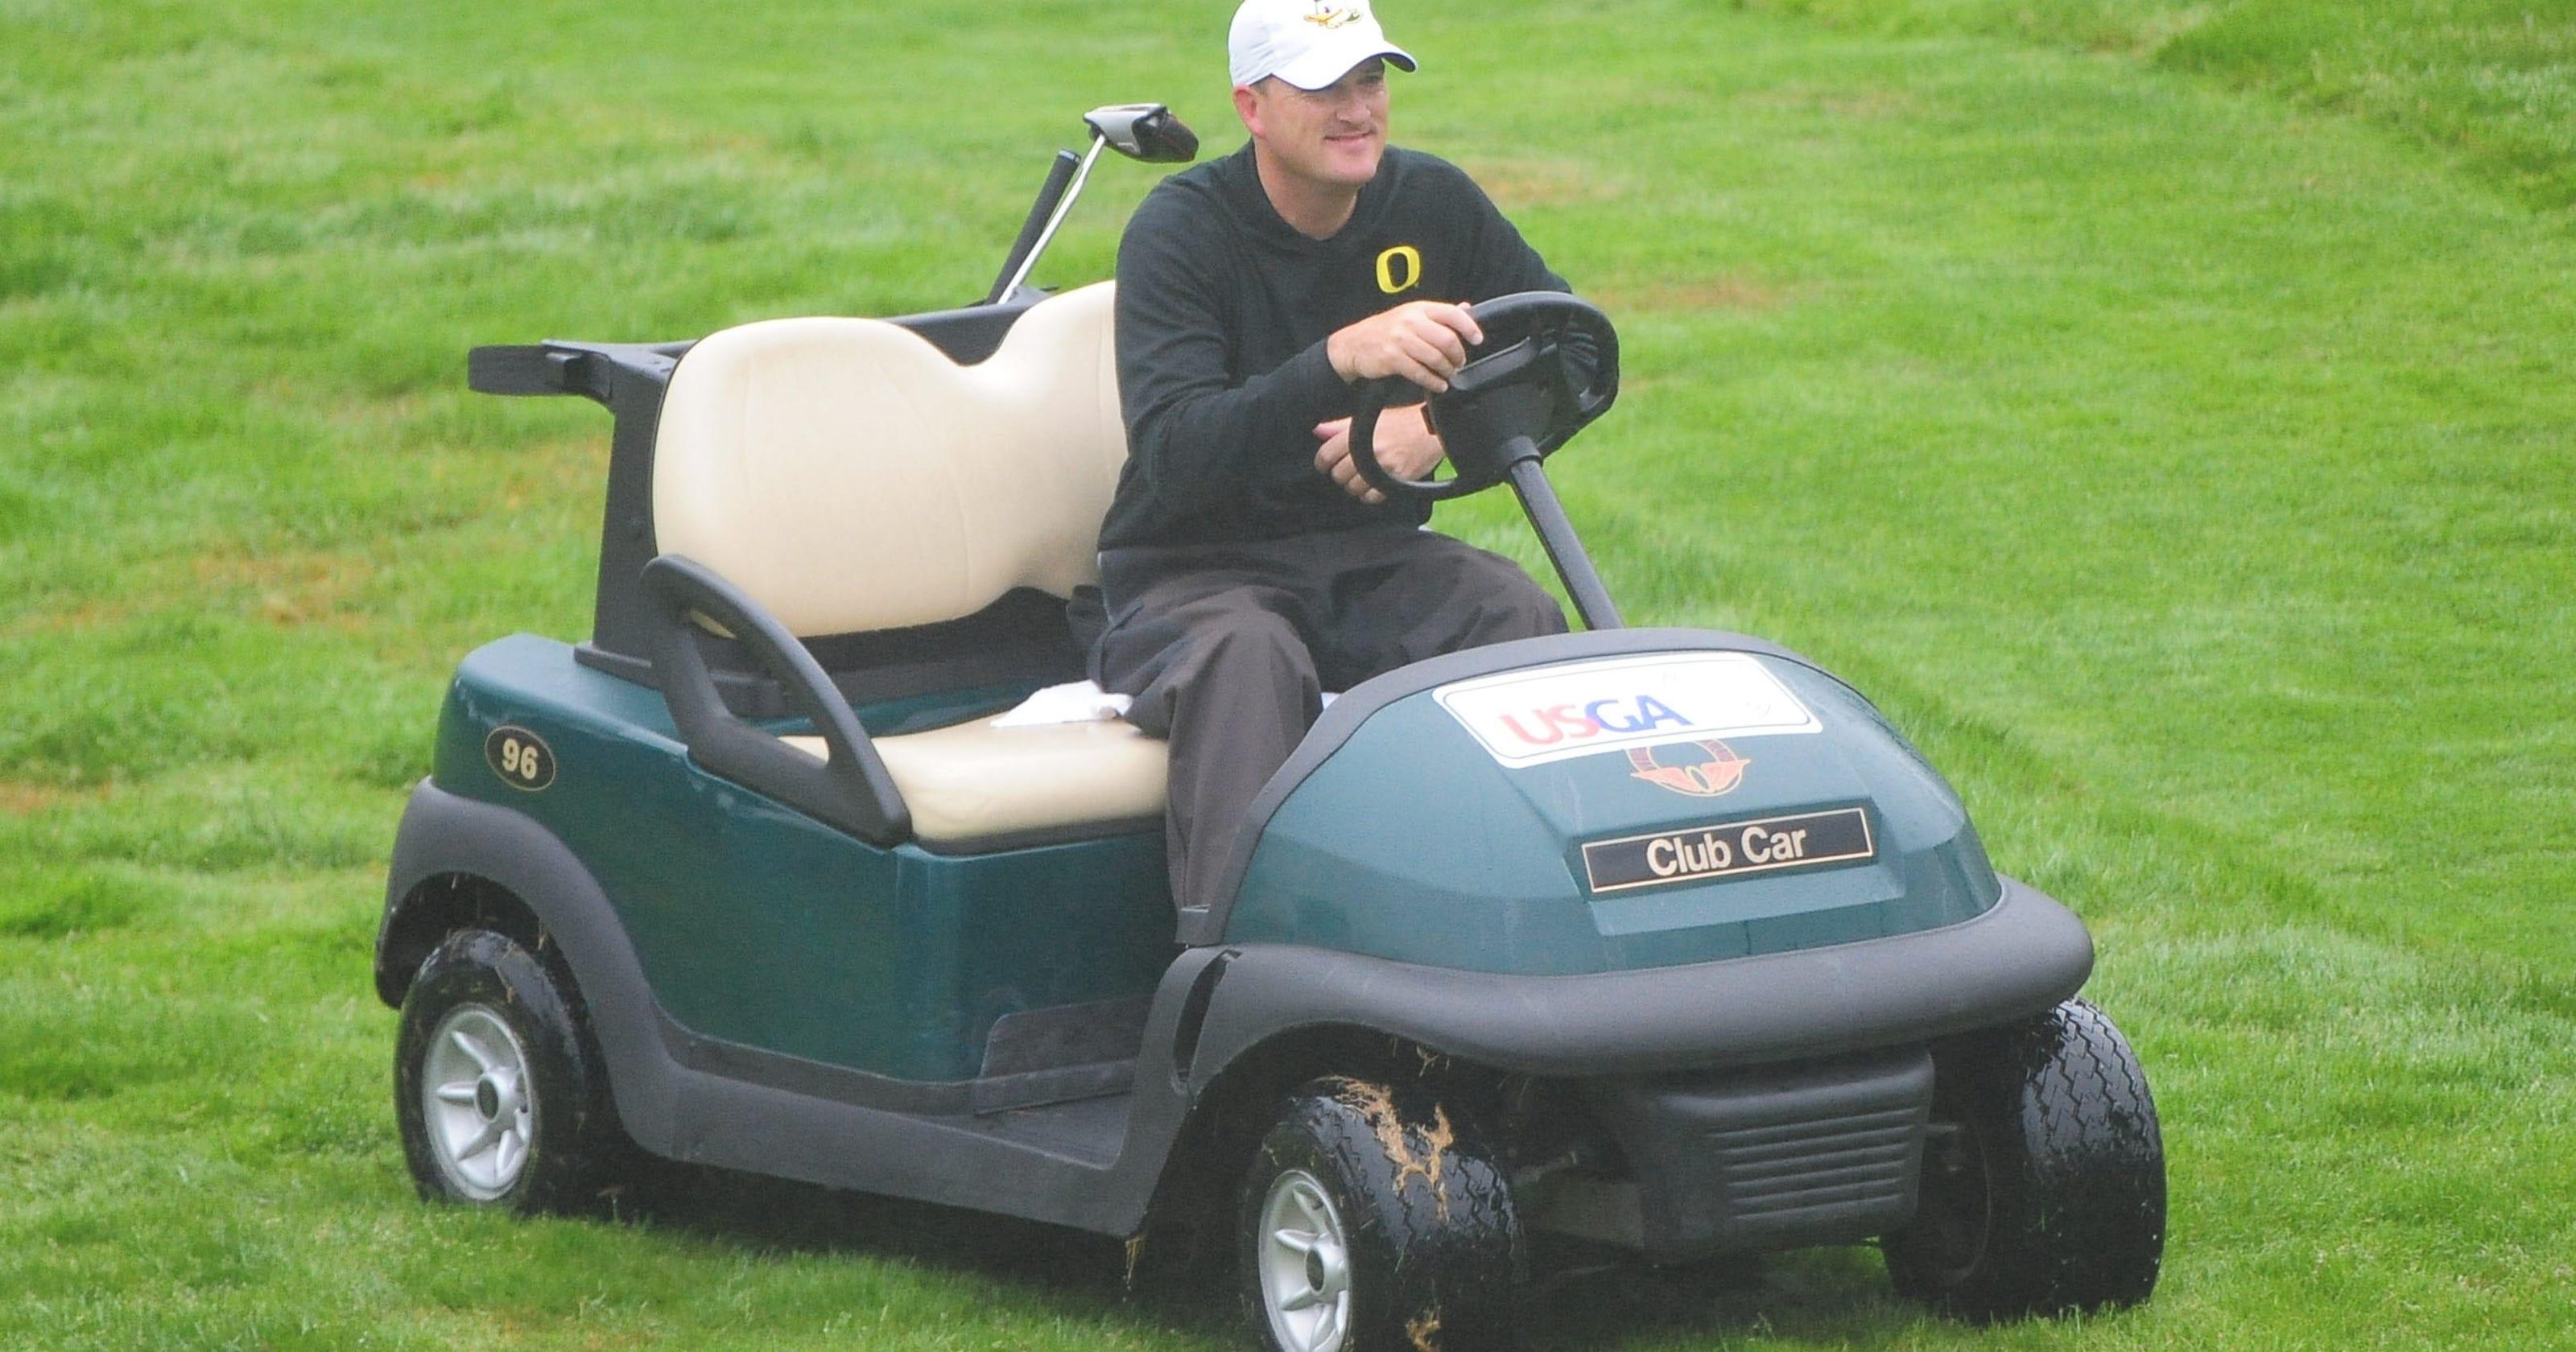 Casey Martin's golf cart sparks controversy again on golf players, golf accessories, golf hitting nets, golf girls, golf trolley, golf cartoons, golf card, golf buggy, golf tools, golf handicap, golf machine, golf words, golf games,